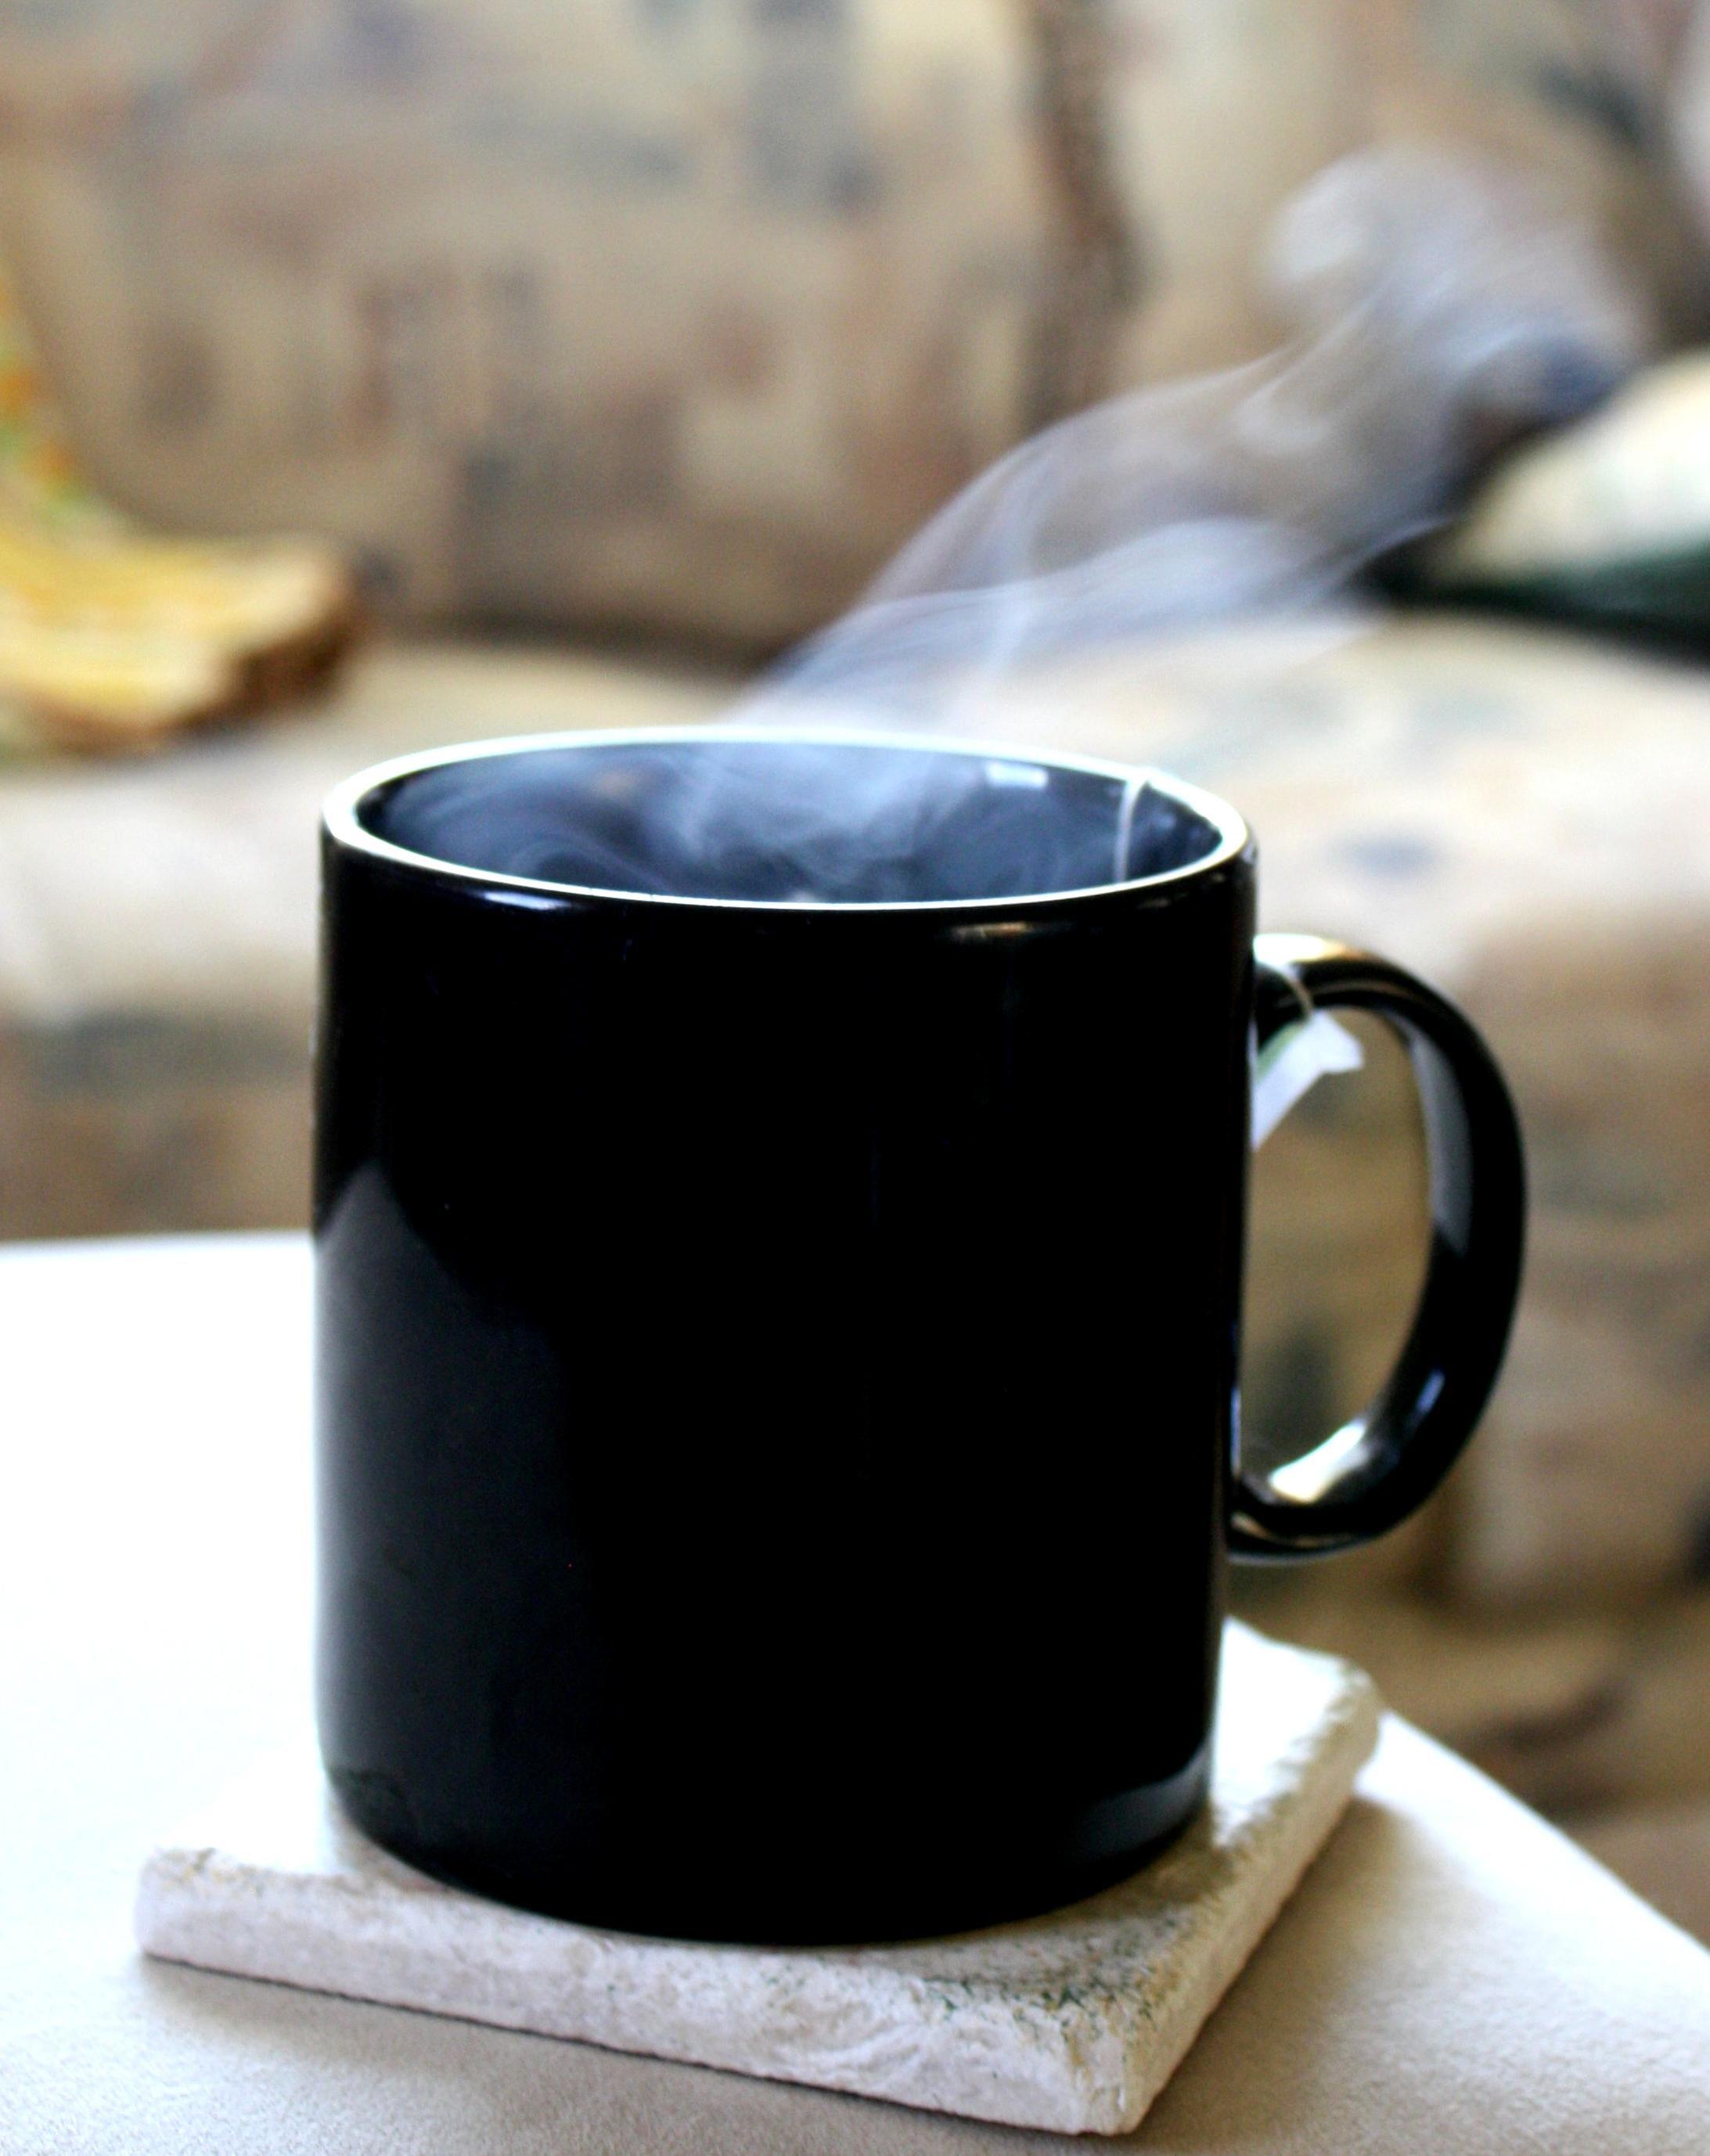 Free Picture Hot Tea Steam Rising Cup Tea Mug